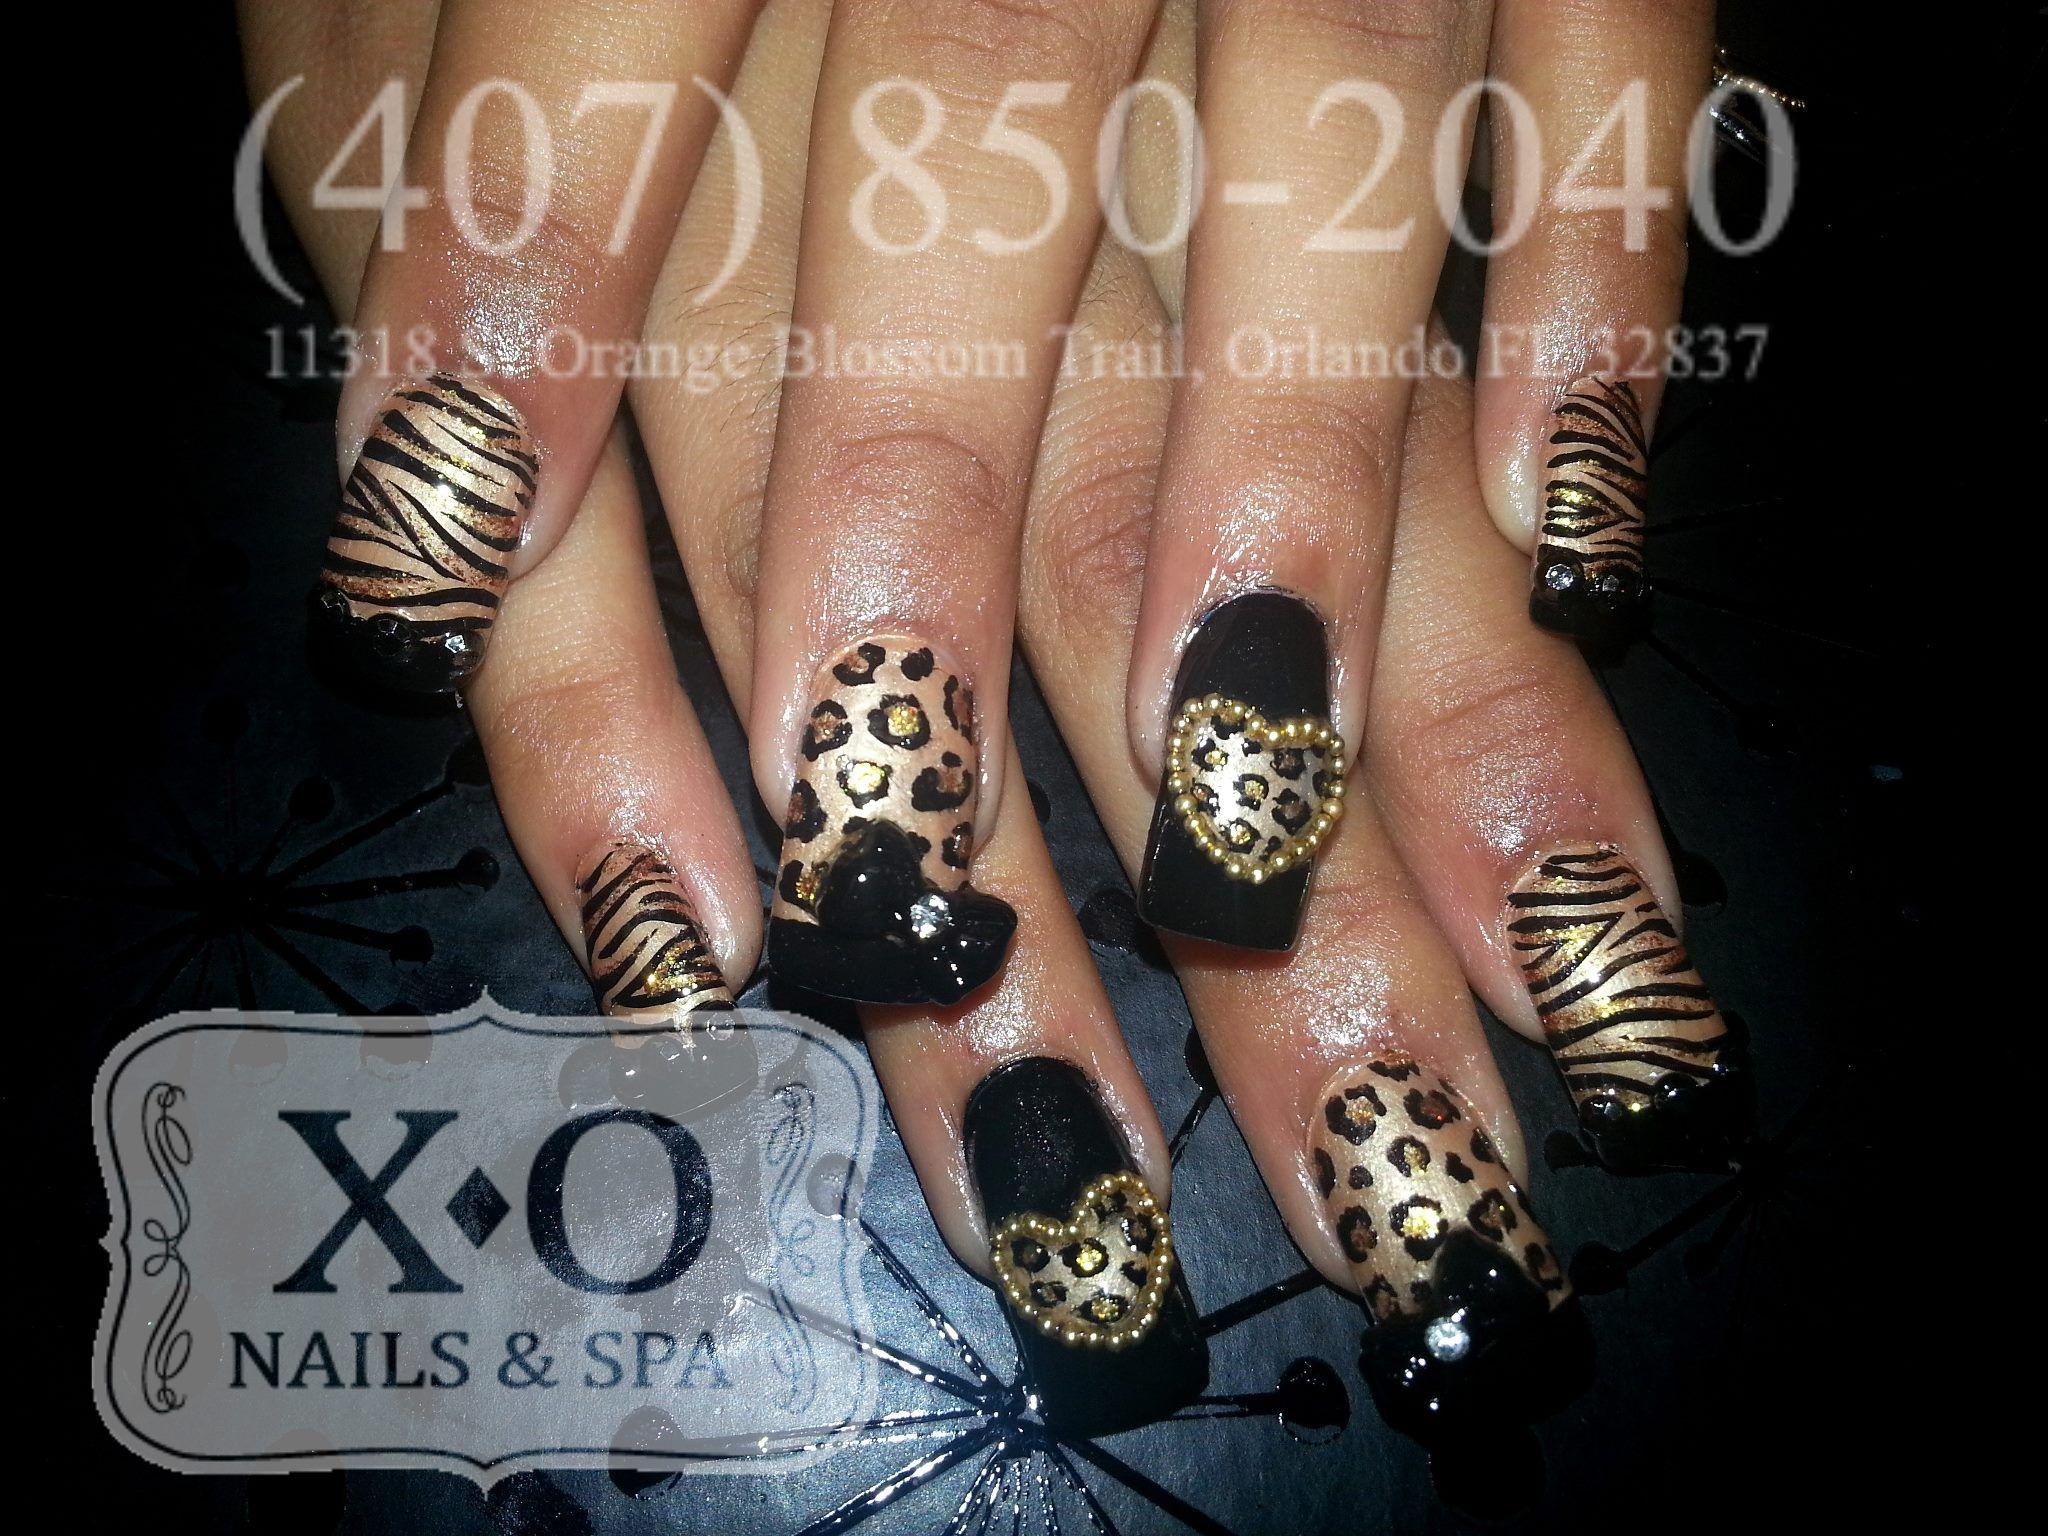 Pin by XO Nails Orlando on XO Nails Orlando | Pinterest | Diamond ...